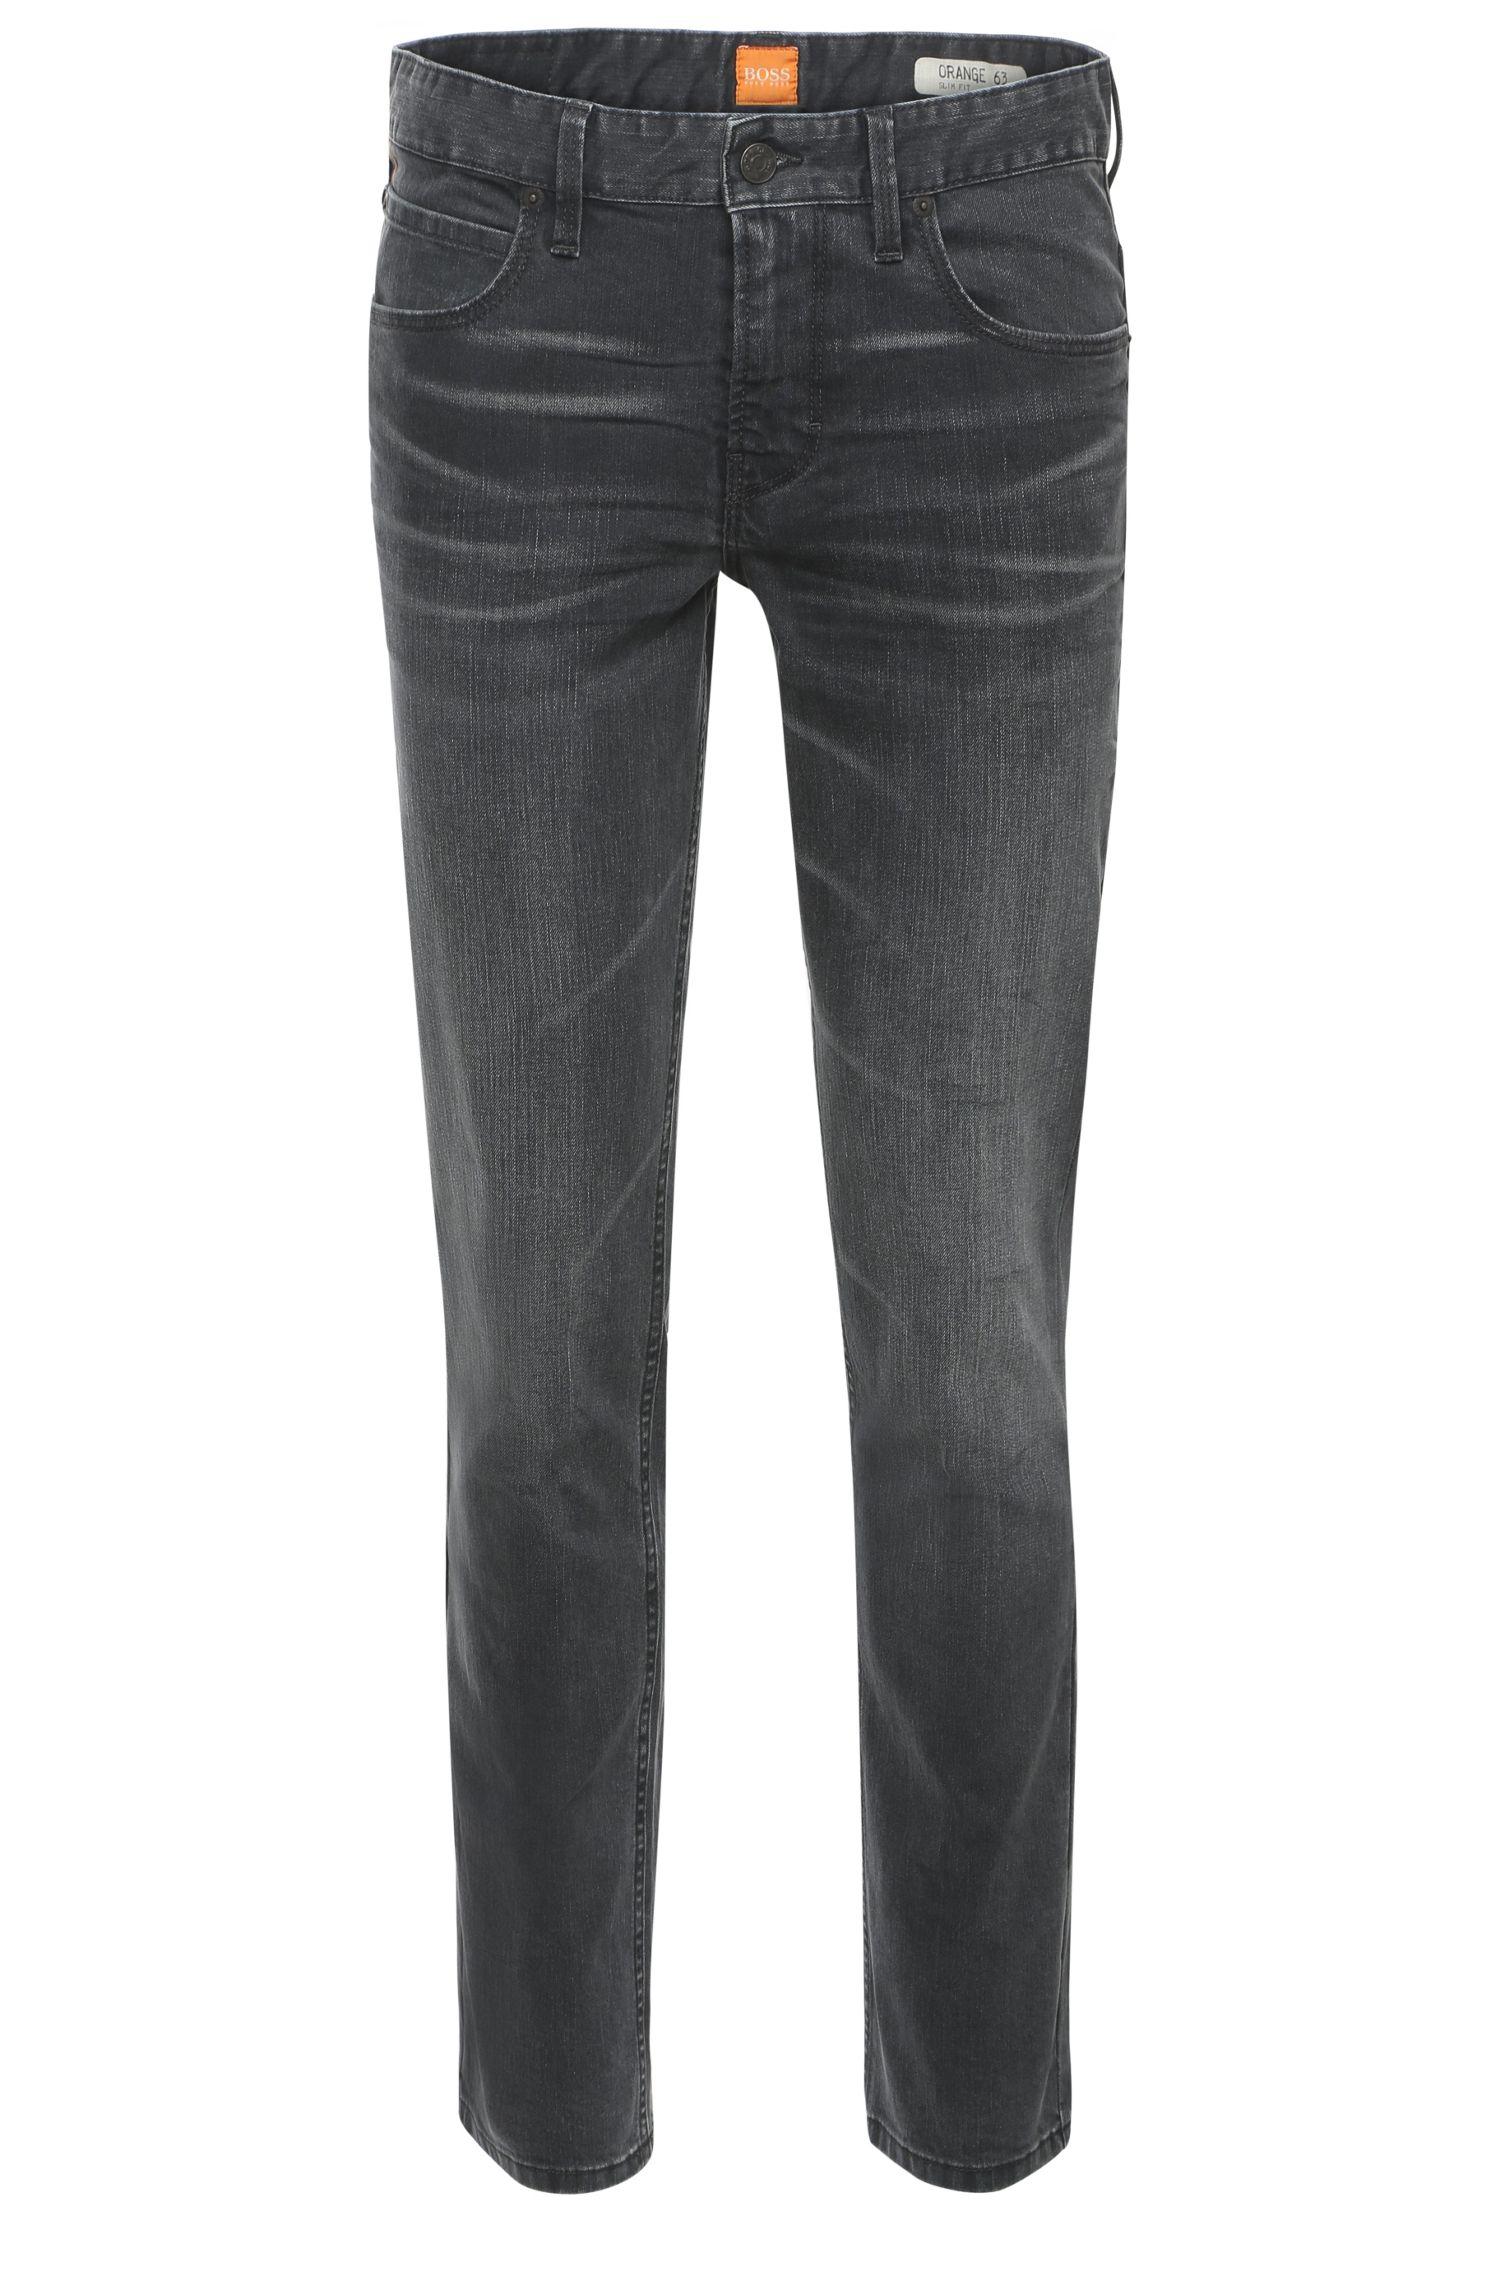 'Orange63' | Slim Fit, 9.5 oz Stretch Cotton Blend Jeans